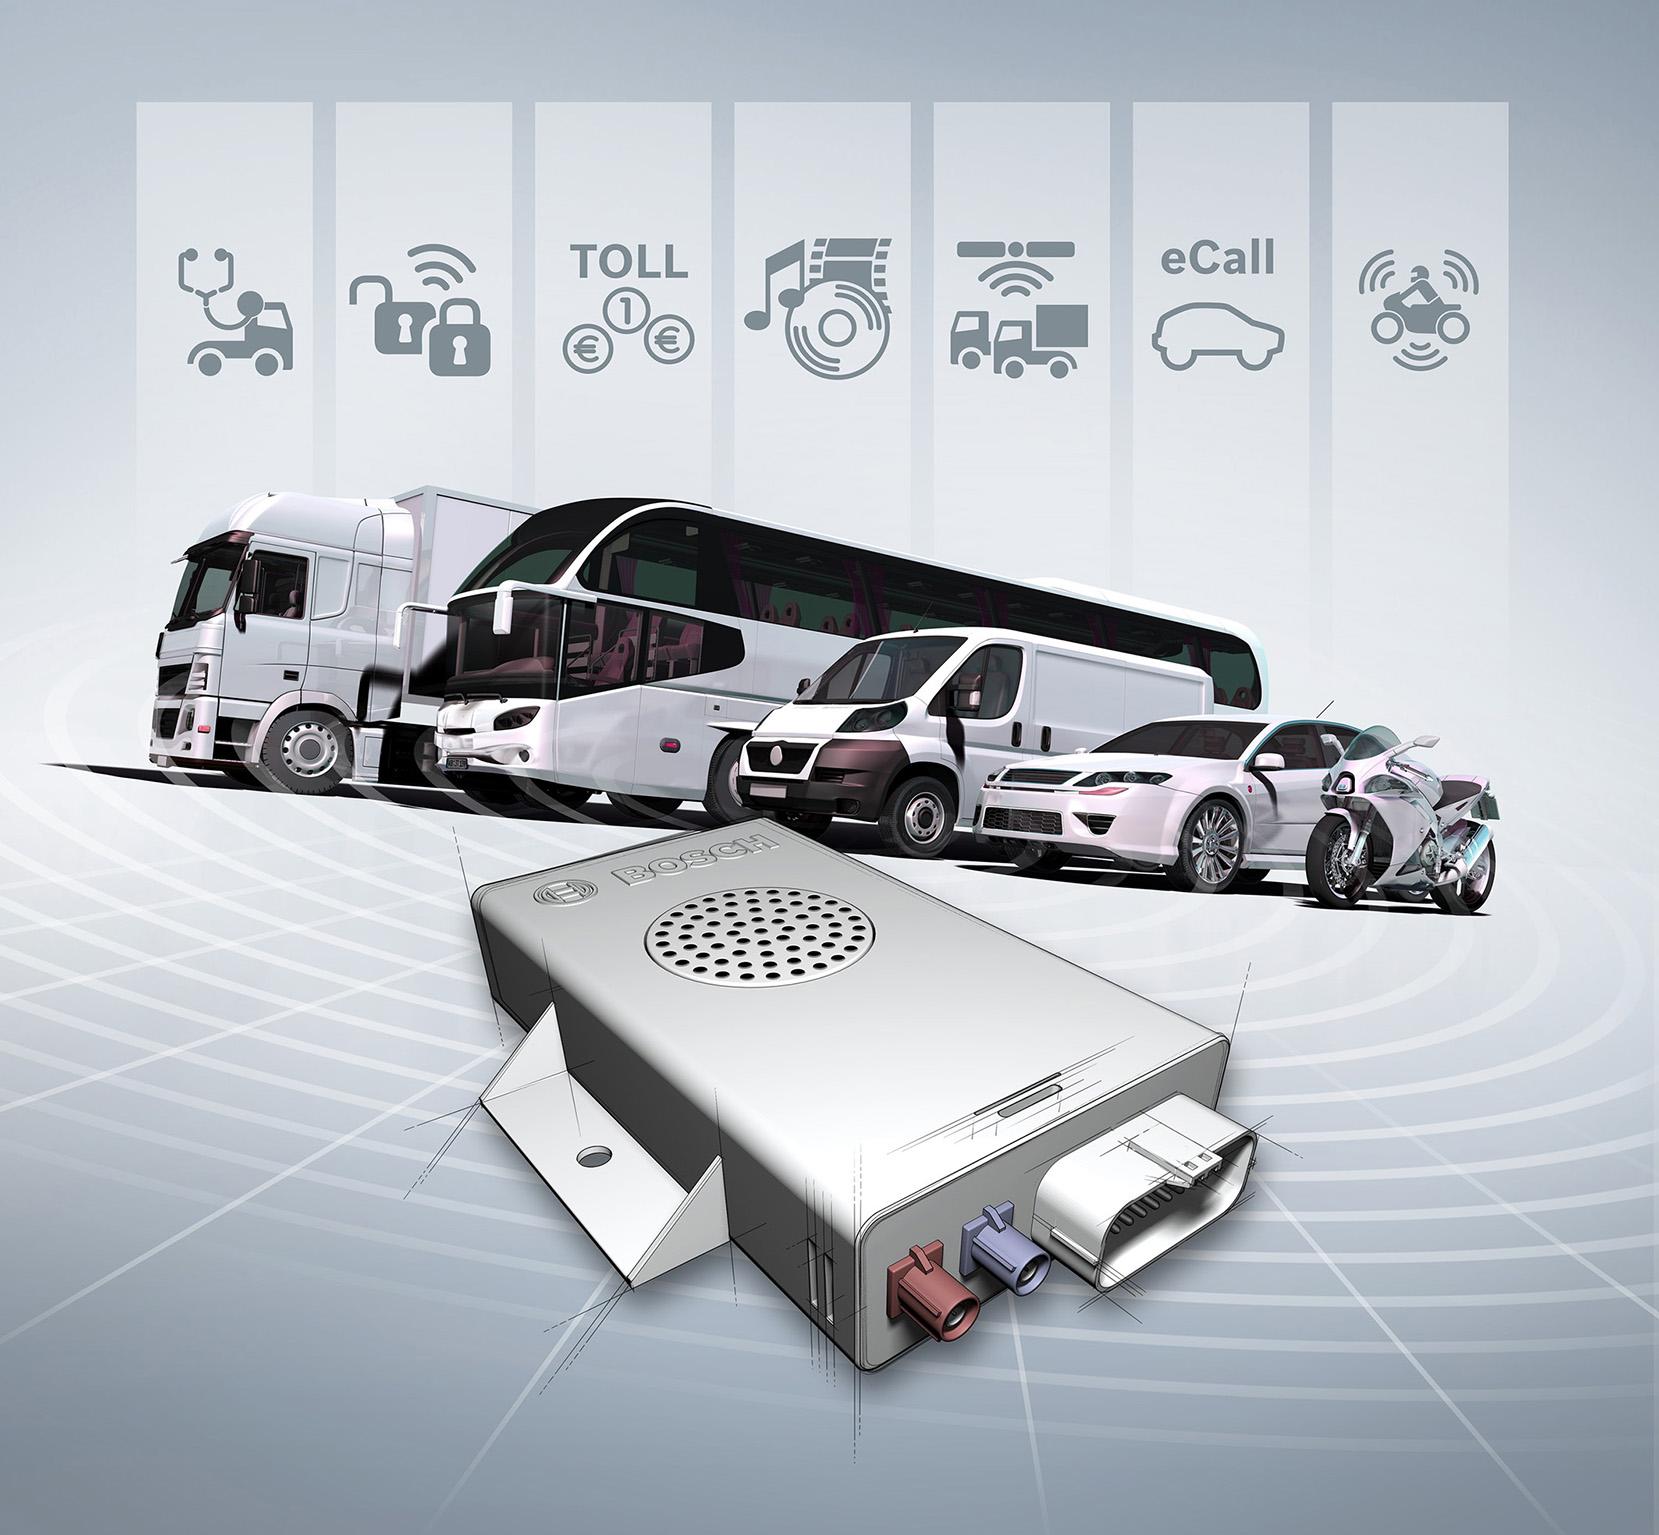 Bosch connected car control unit